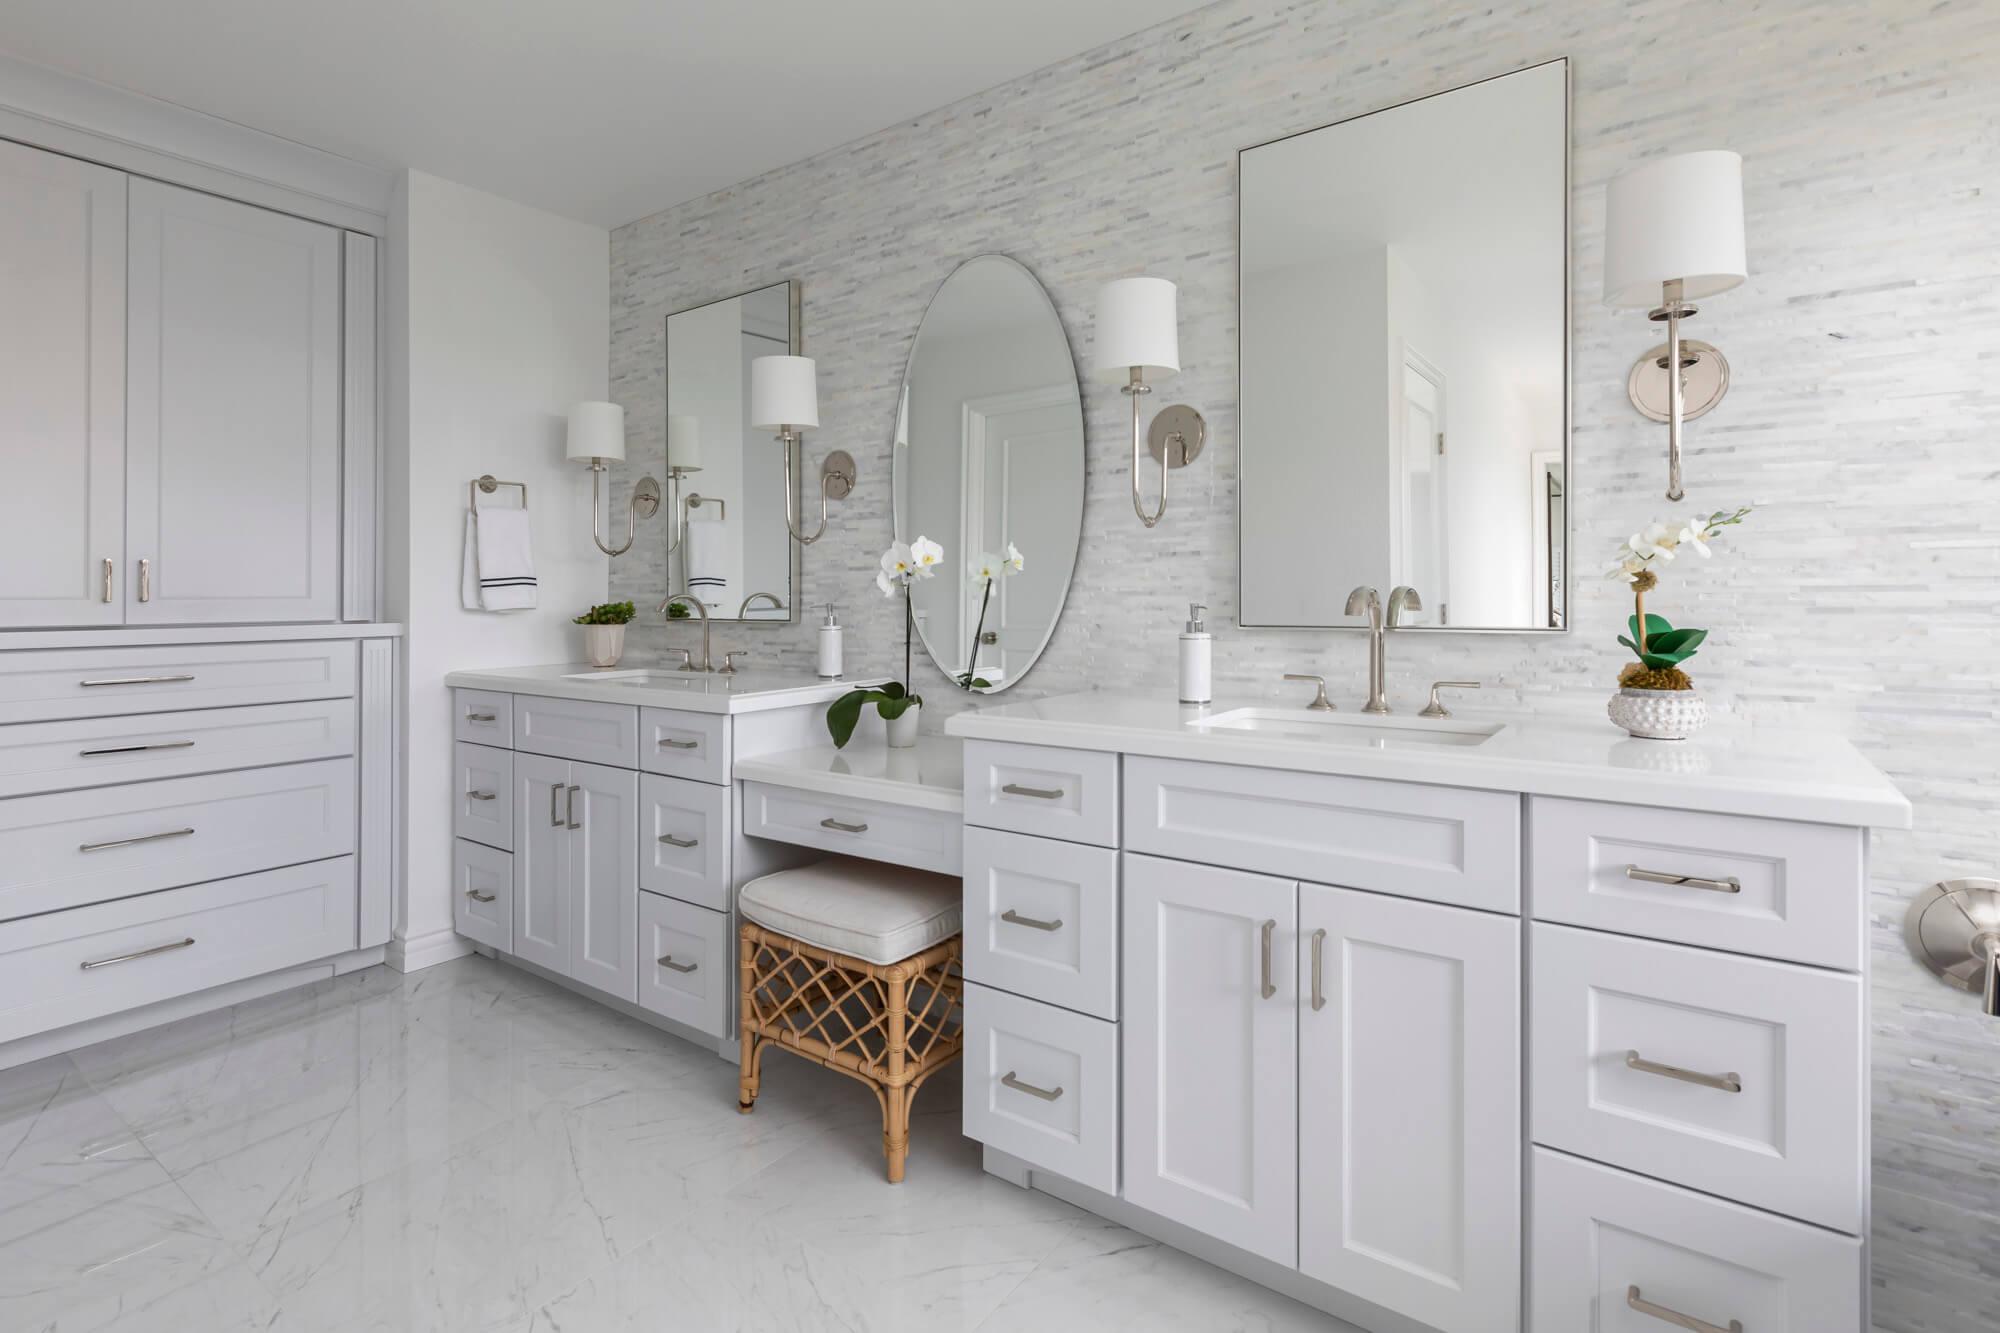 Natural-stone-marble-porcelain-flooring-in-bathroom-remodel